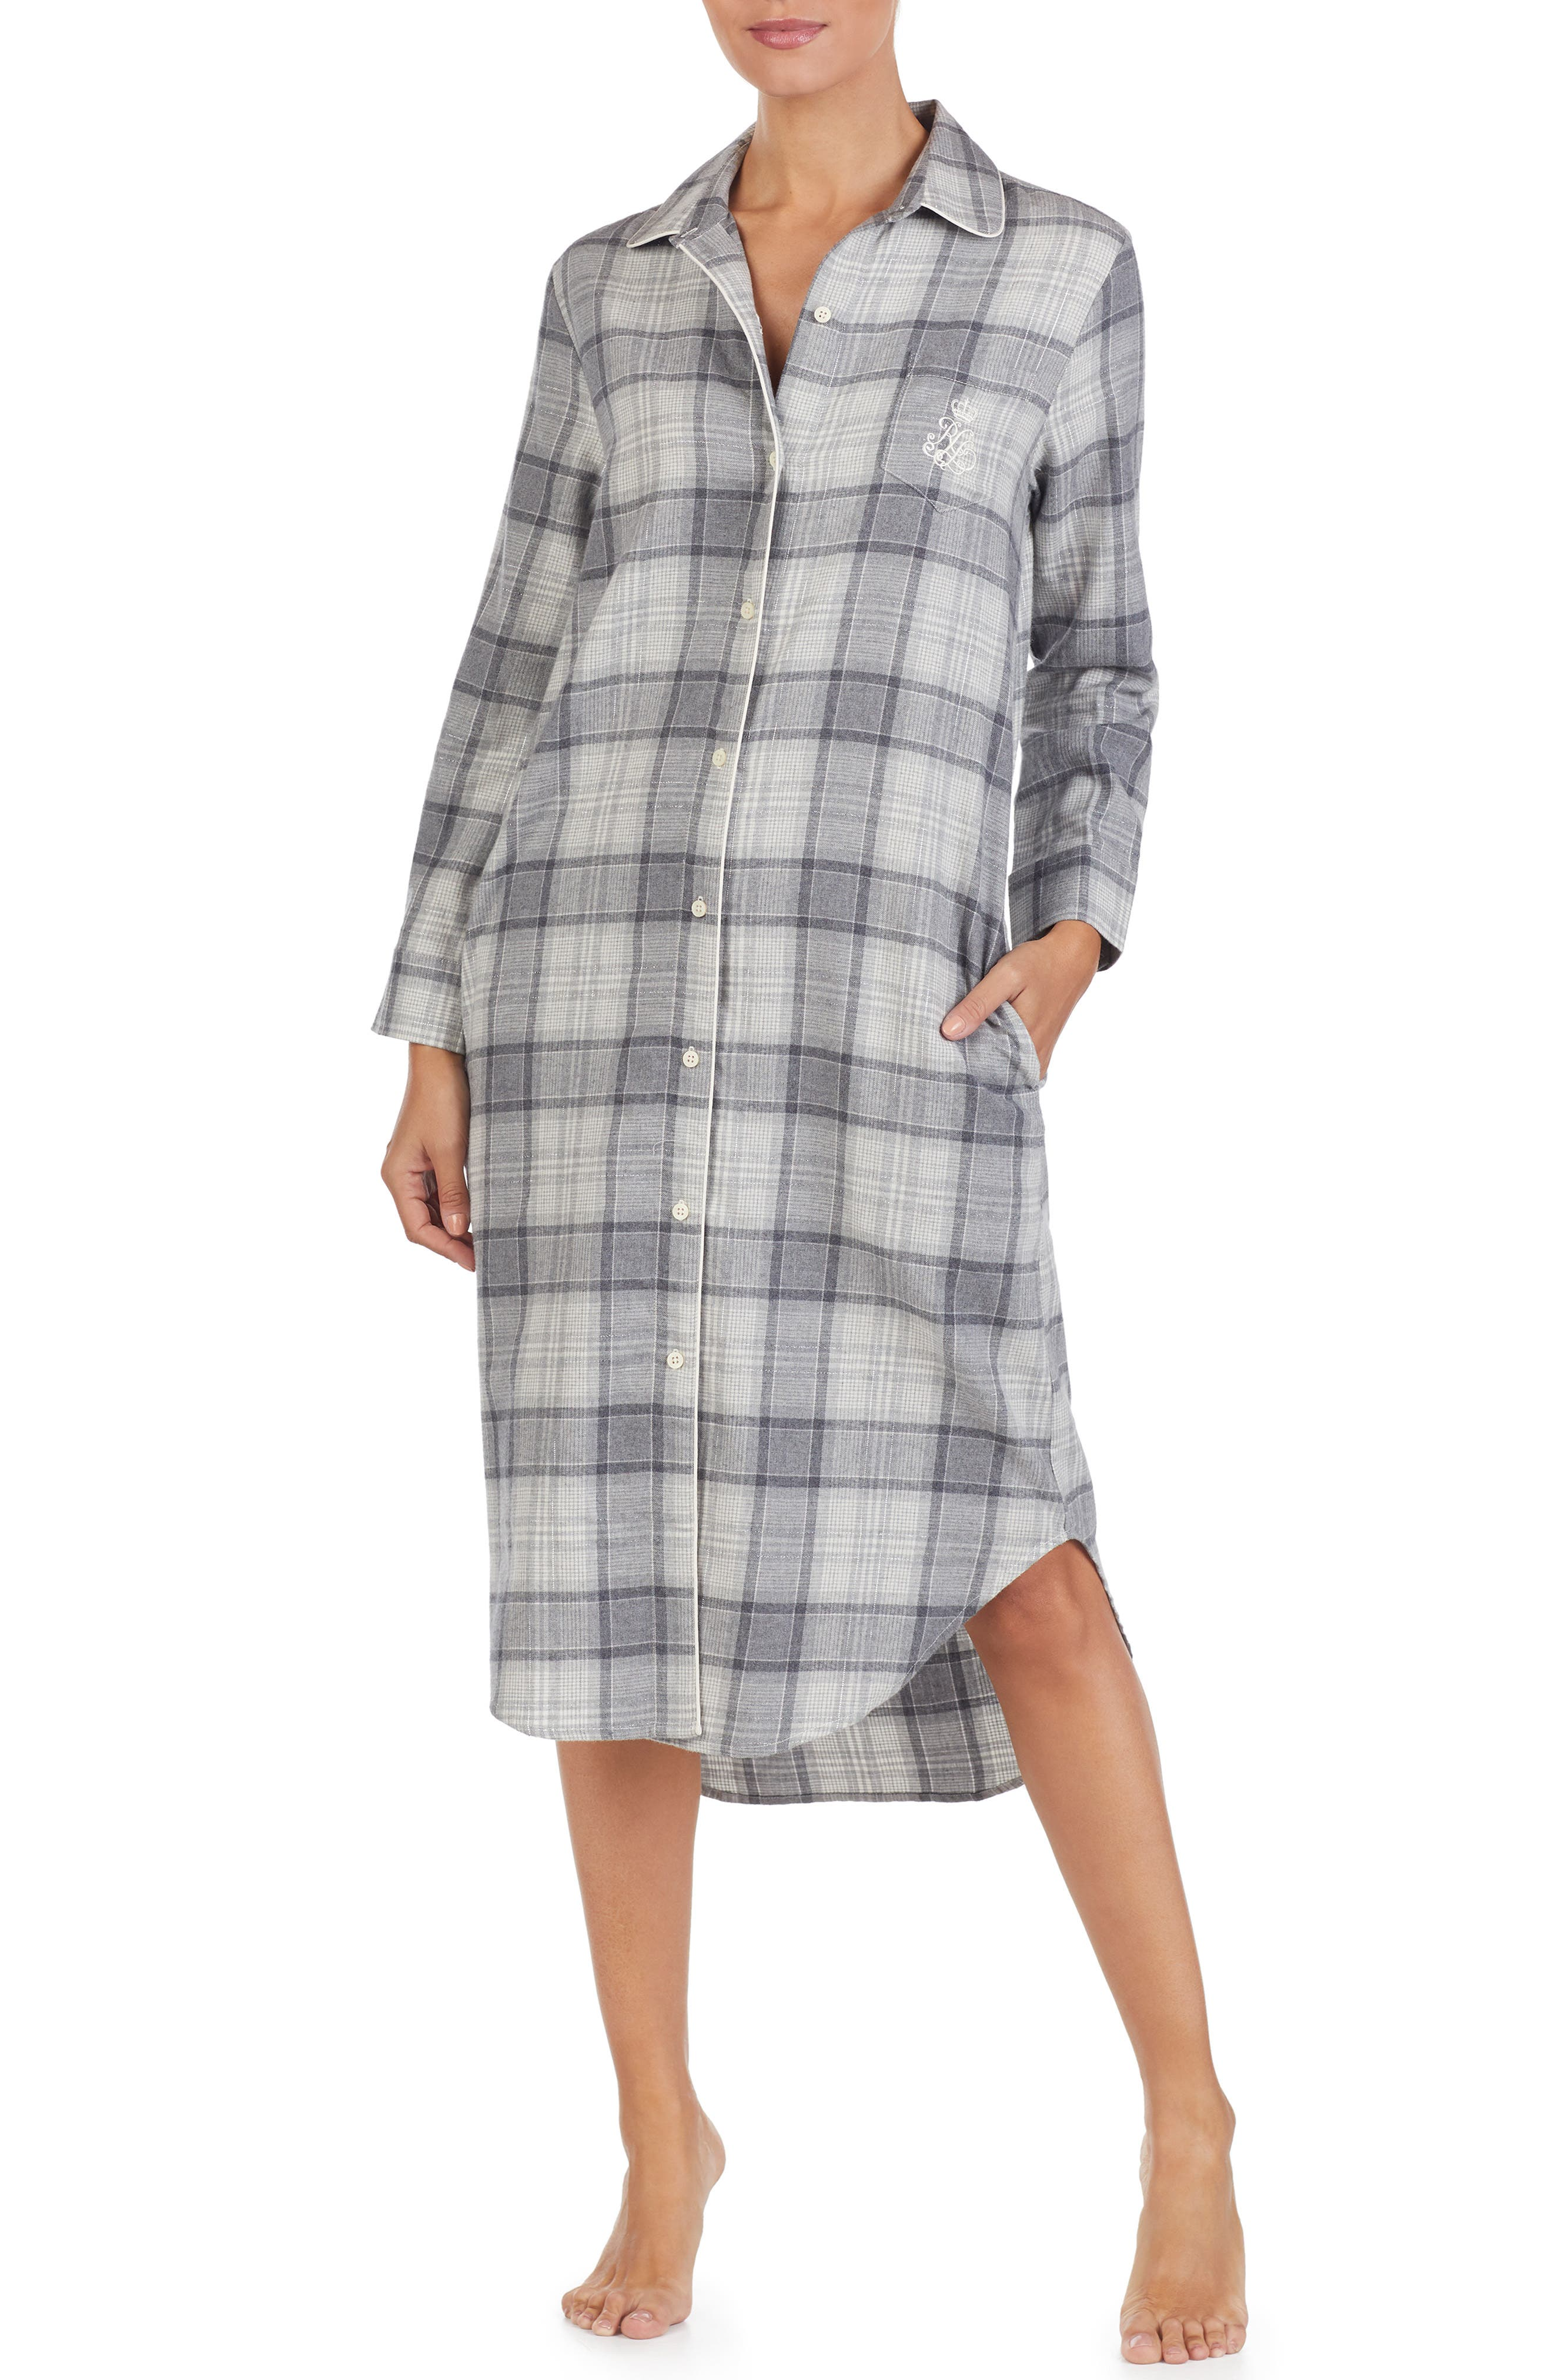 Plaid Flannel Sleep Shirt,                             Main thumbnail 1, color,                             GREY PLAID